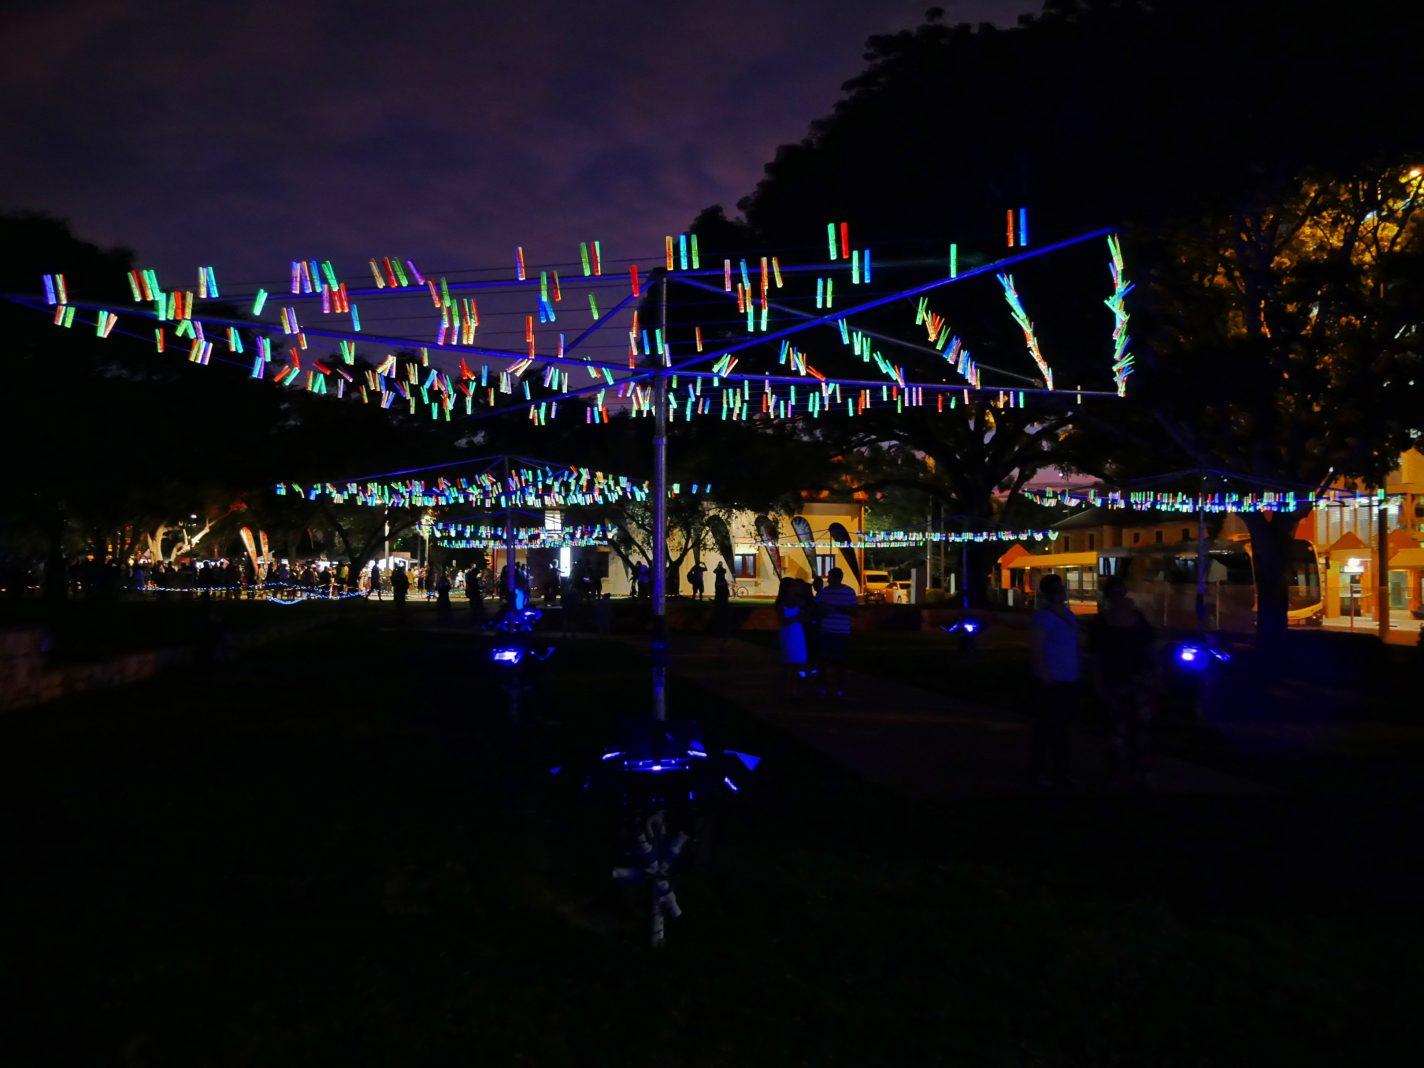 Wasmolens vol met verlichte wasknijpers - Bruce Munro